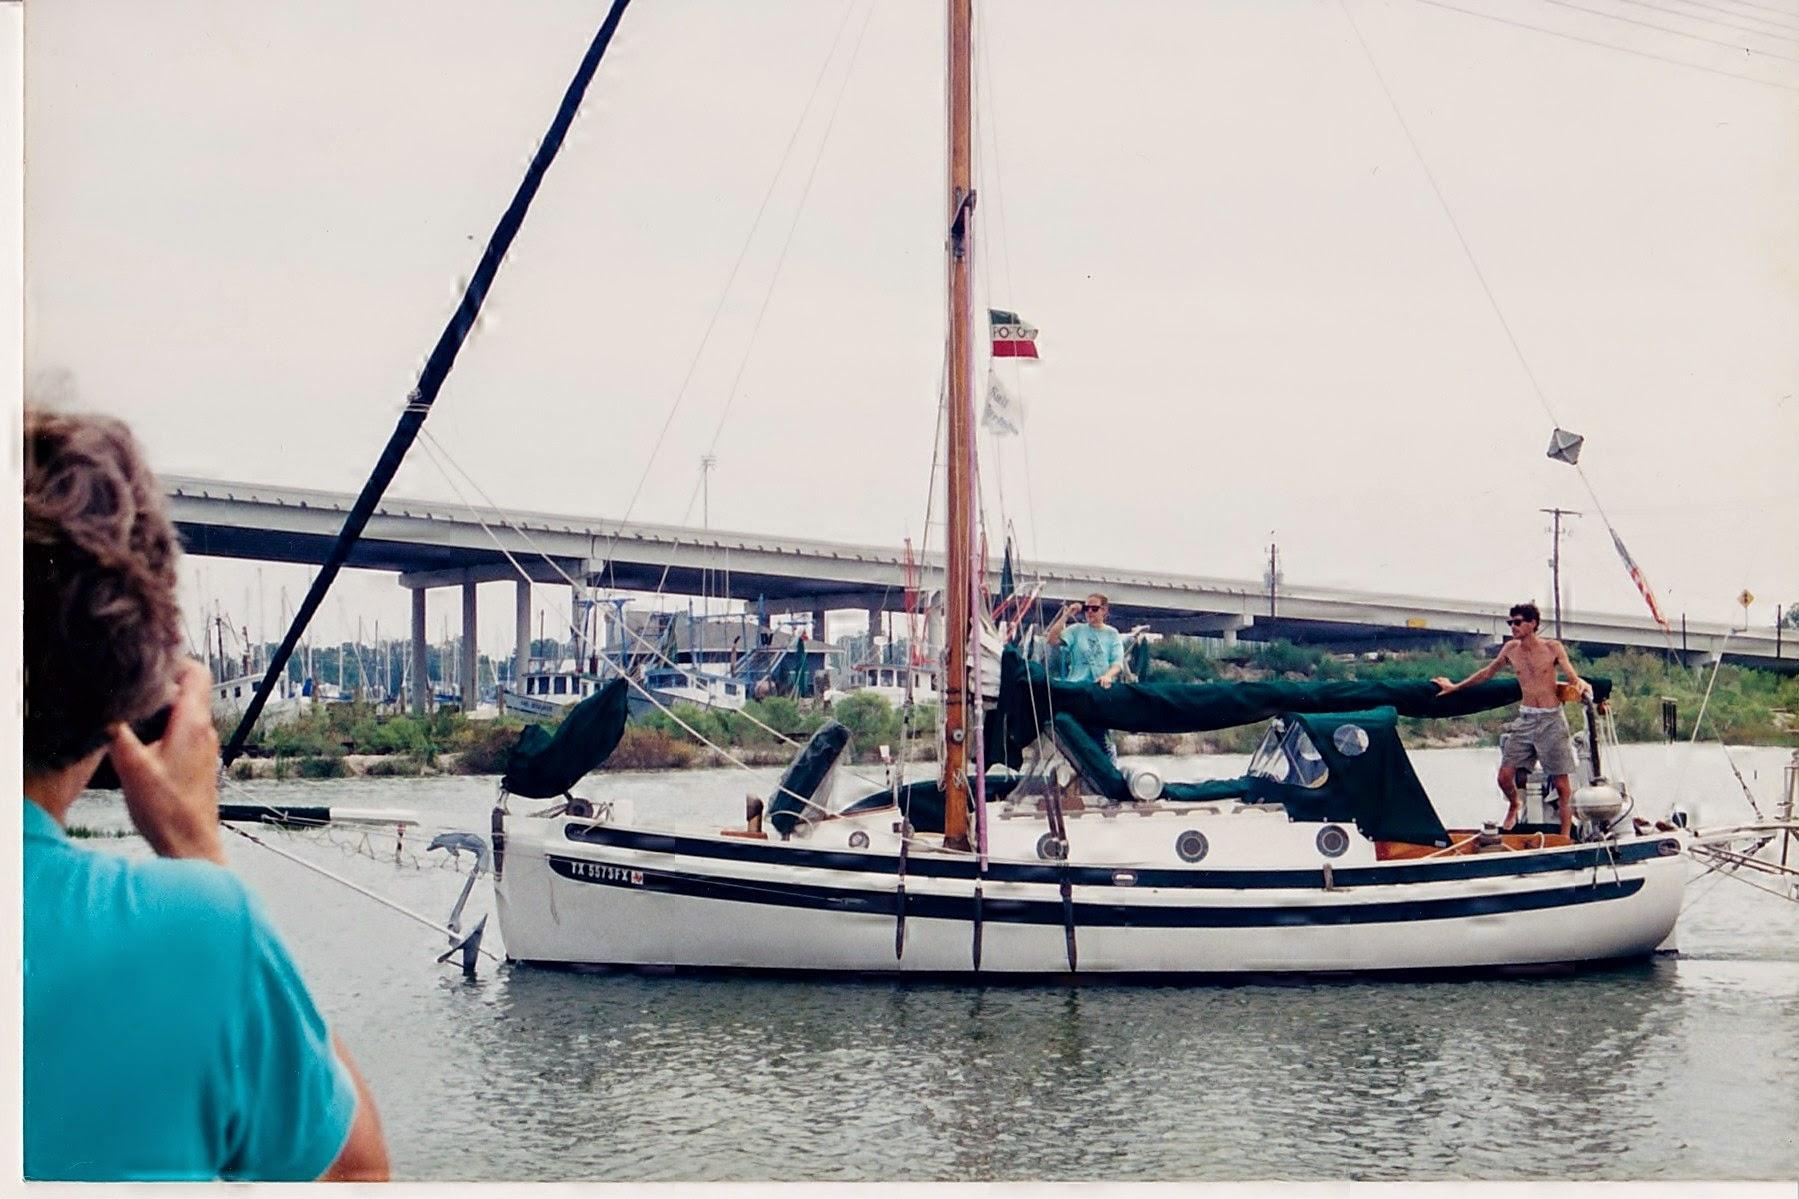 Sail off under the bridge. Despite the naysayers.